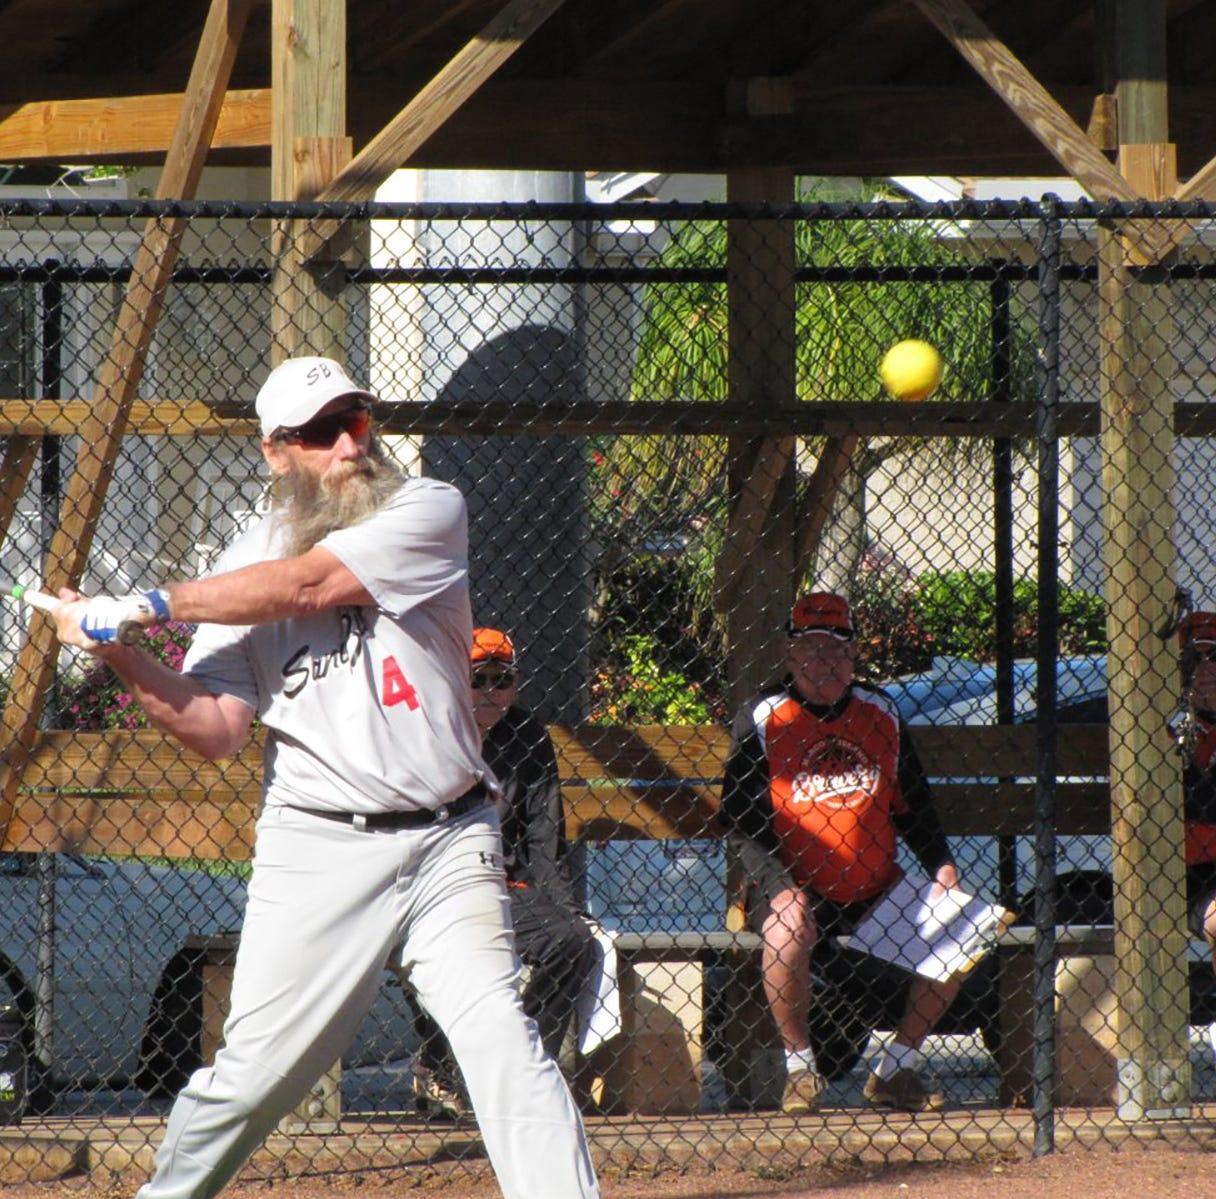 Senior Softball: Triple play, two-hit shutout and 4 one-run games